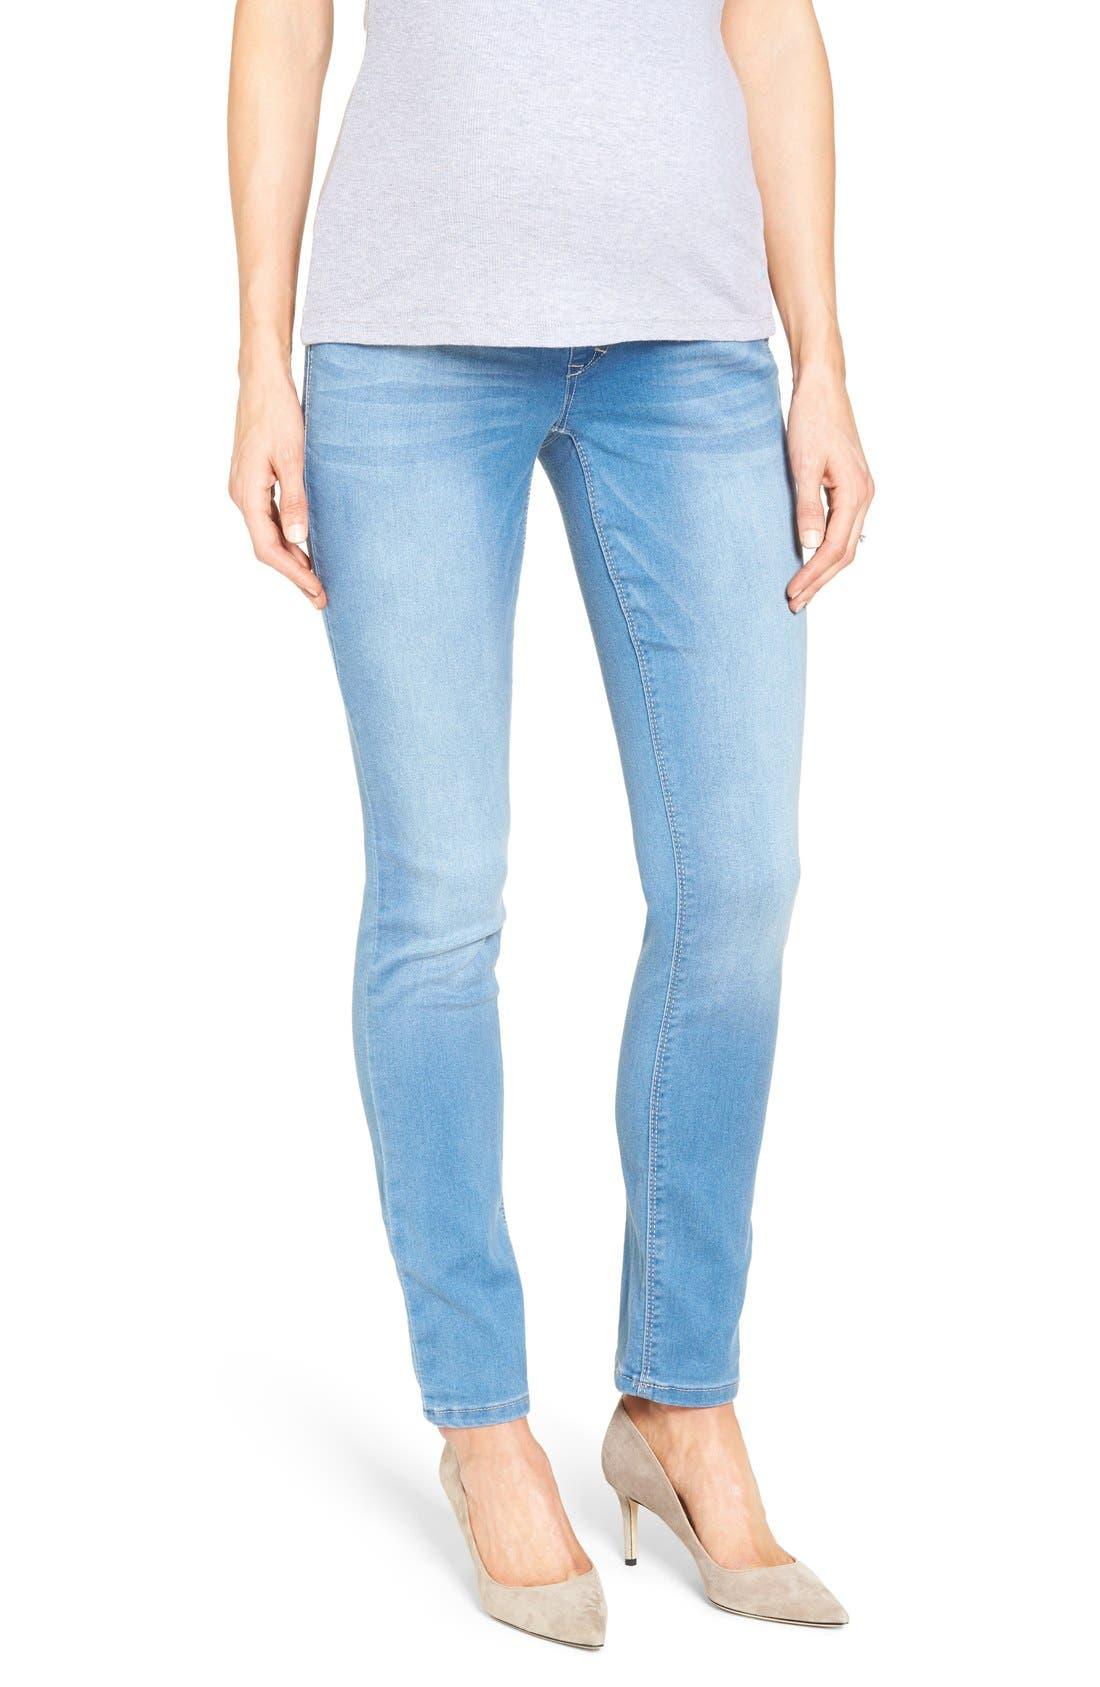 1822 Denim 'Butter' Maternity Skinny Jeans (Mojave)